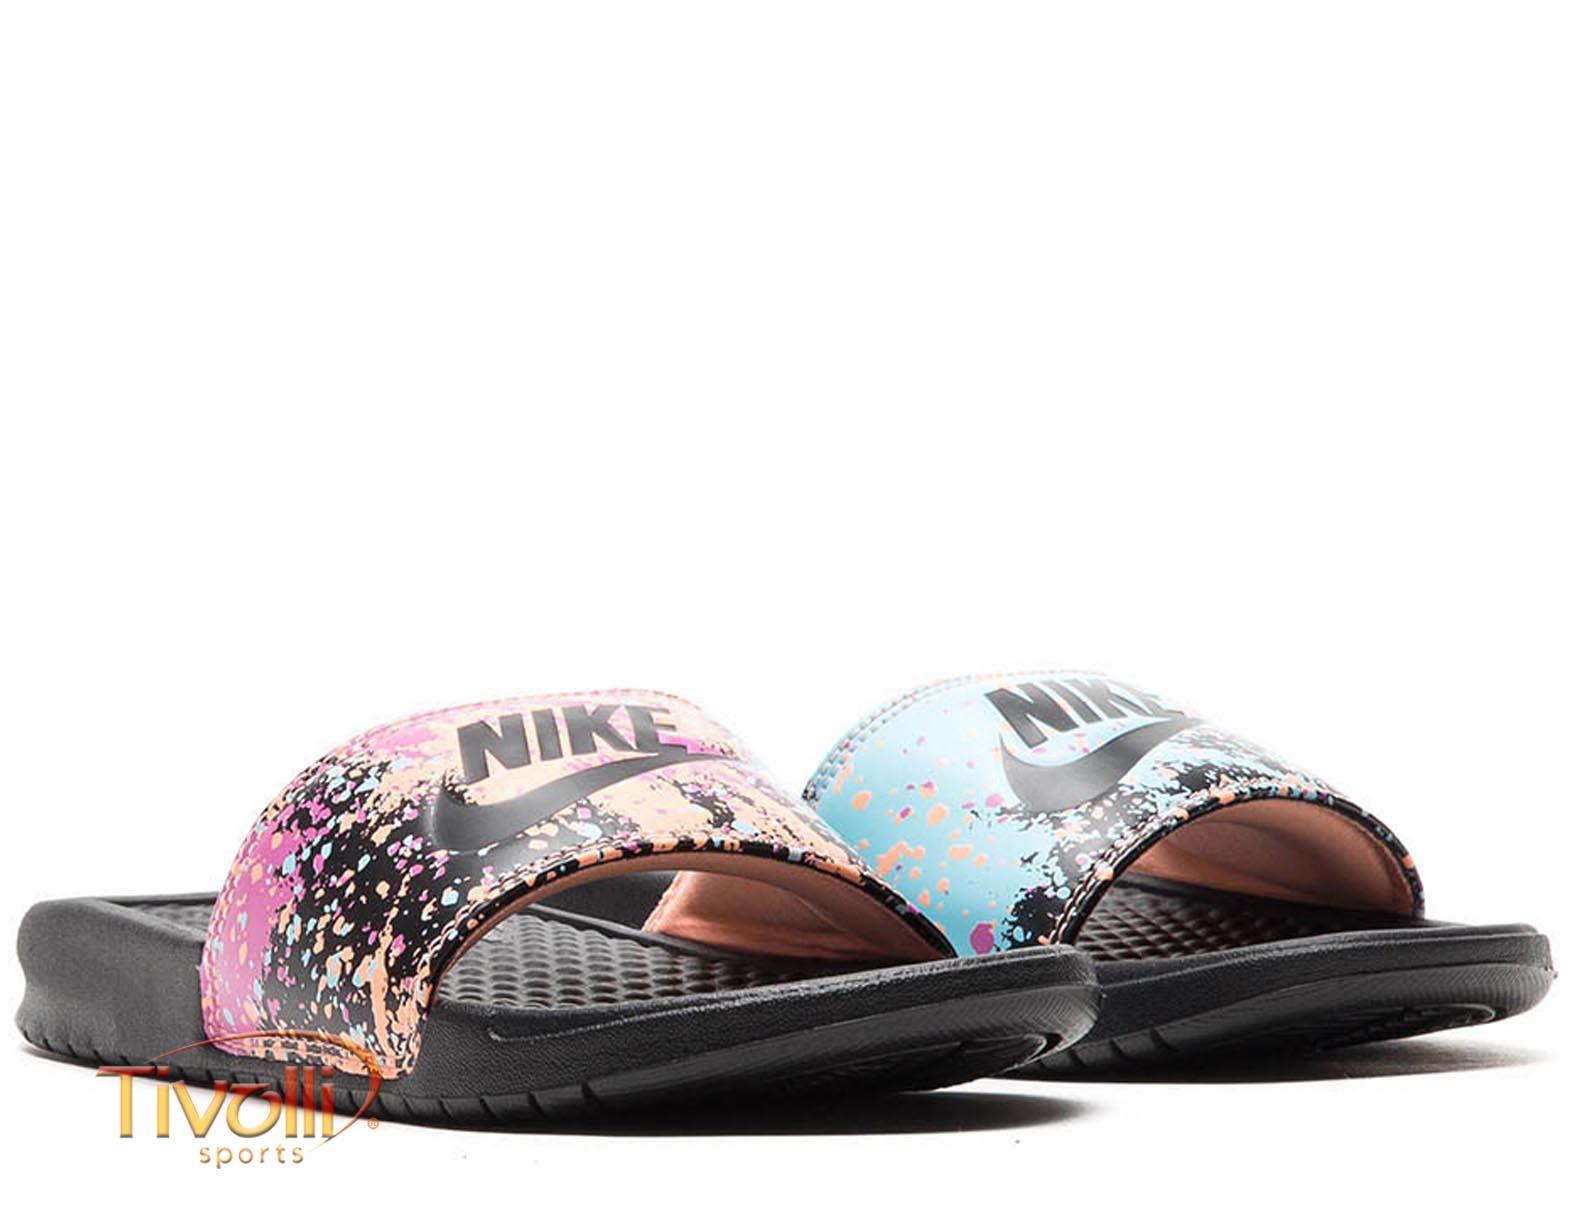 7d876596c49de Chinelo Nike Benassi Just Do It Print > >